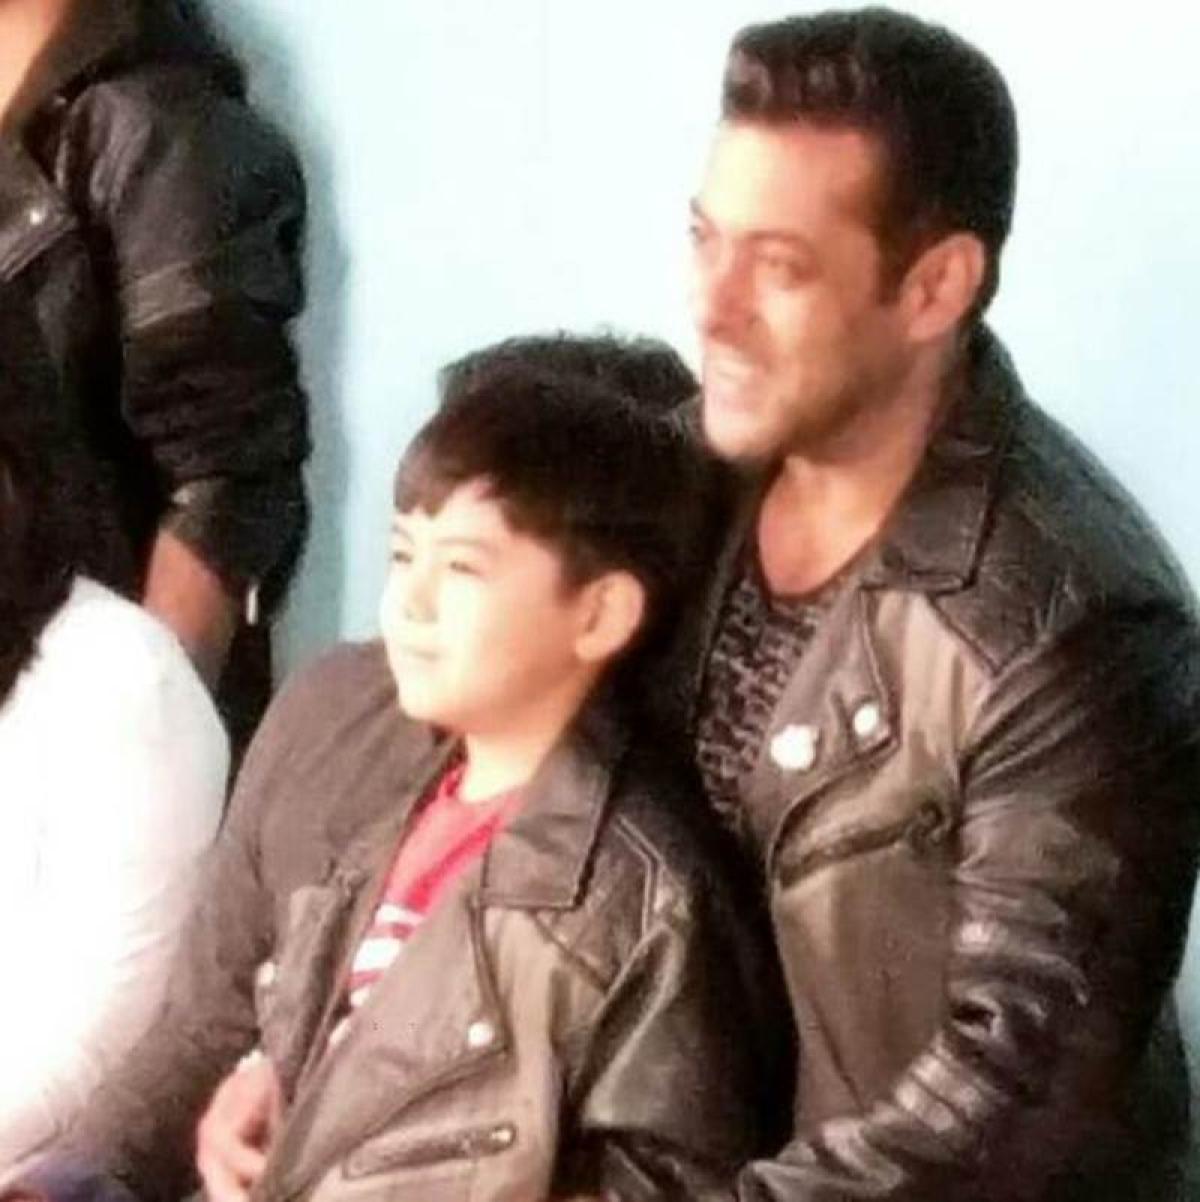 OMG! Salman and Matin Rey Tangu pose for the cameras wearing similar jackets!